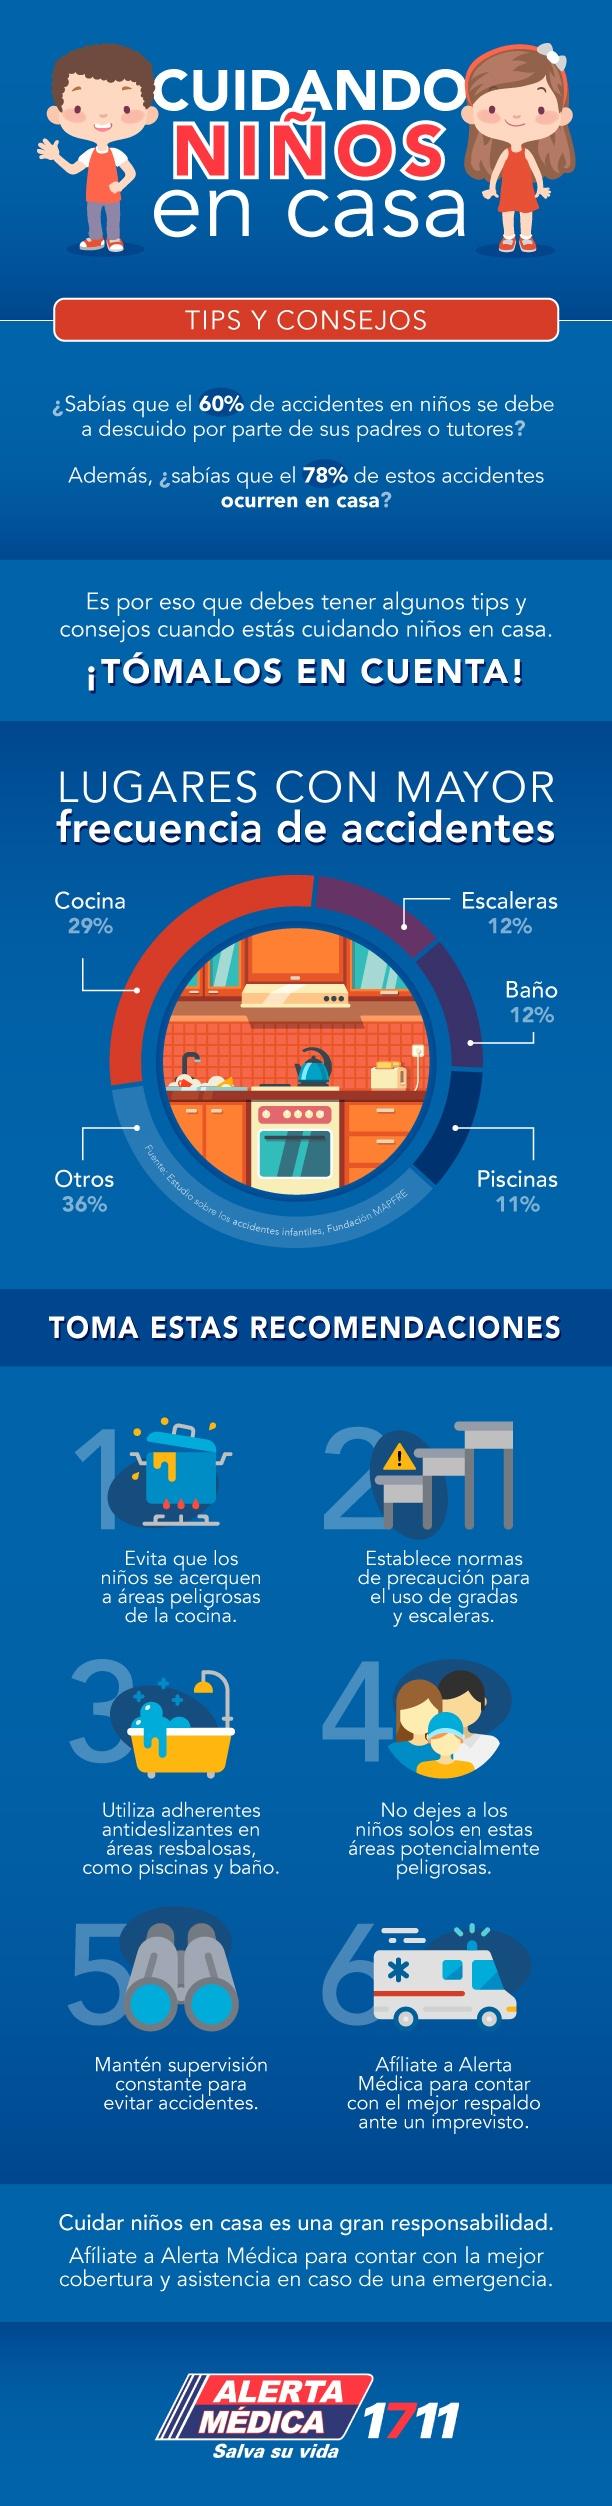 Alerta-Médica-infografía-completa (2)